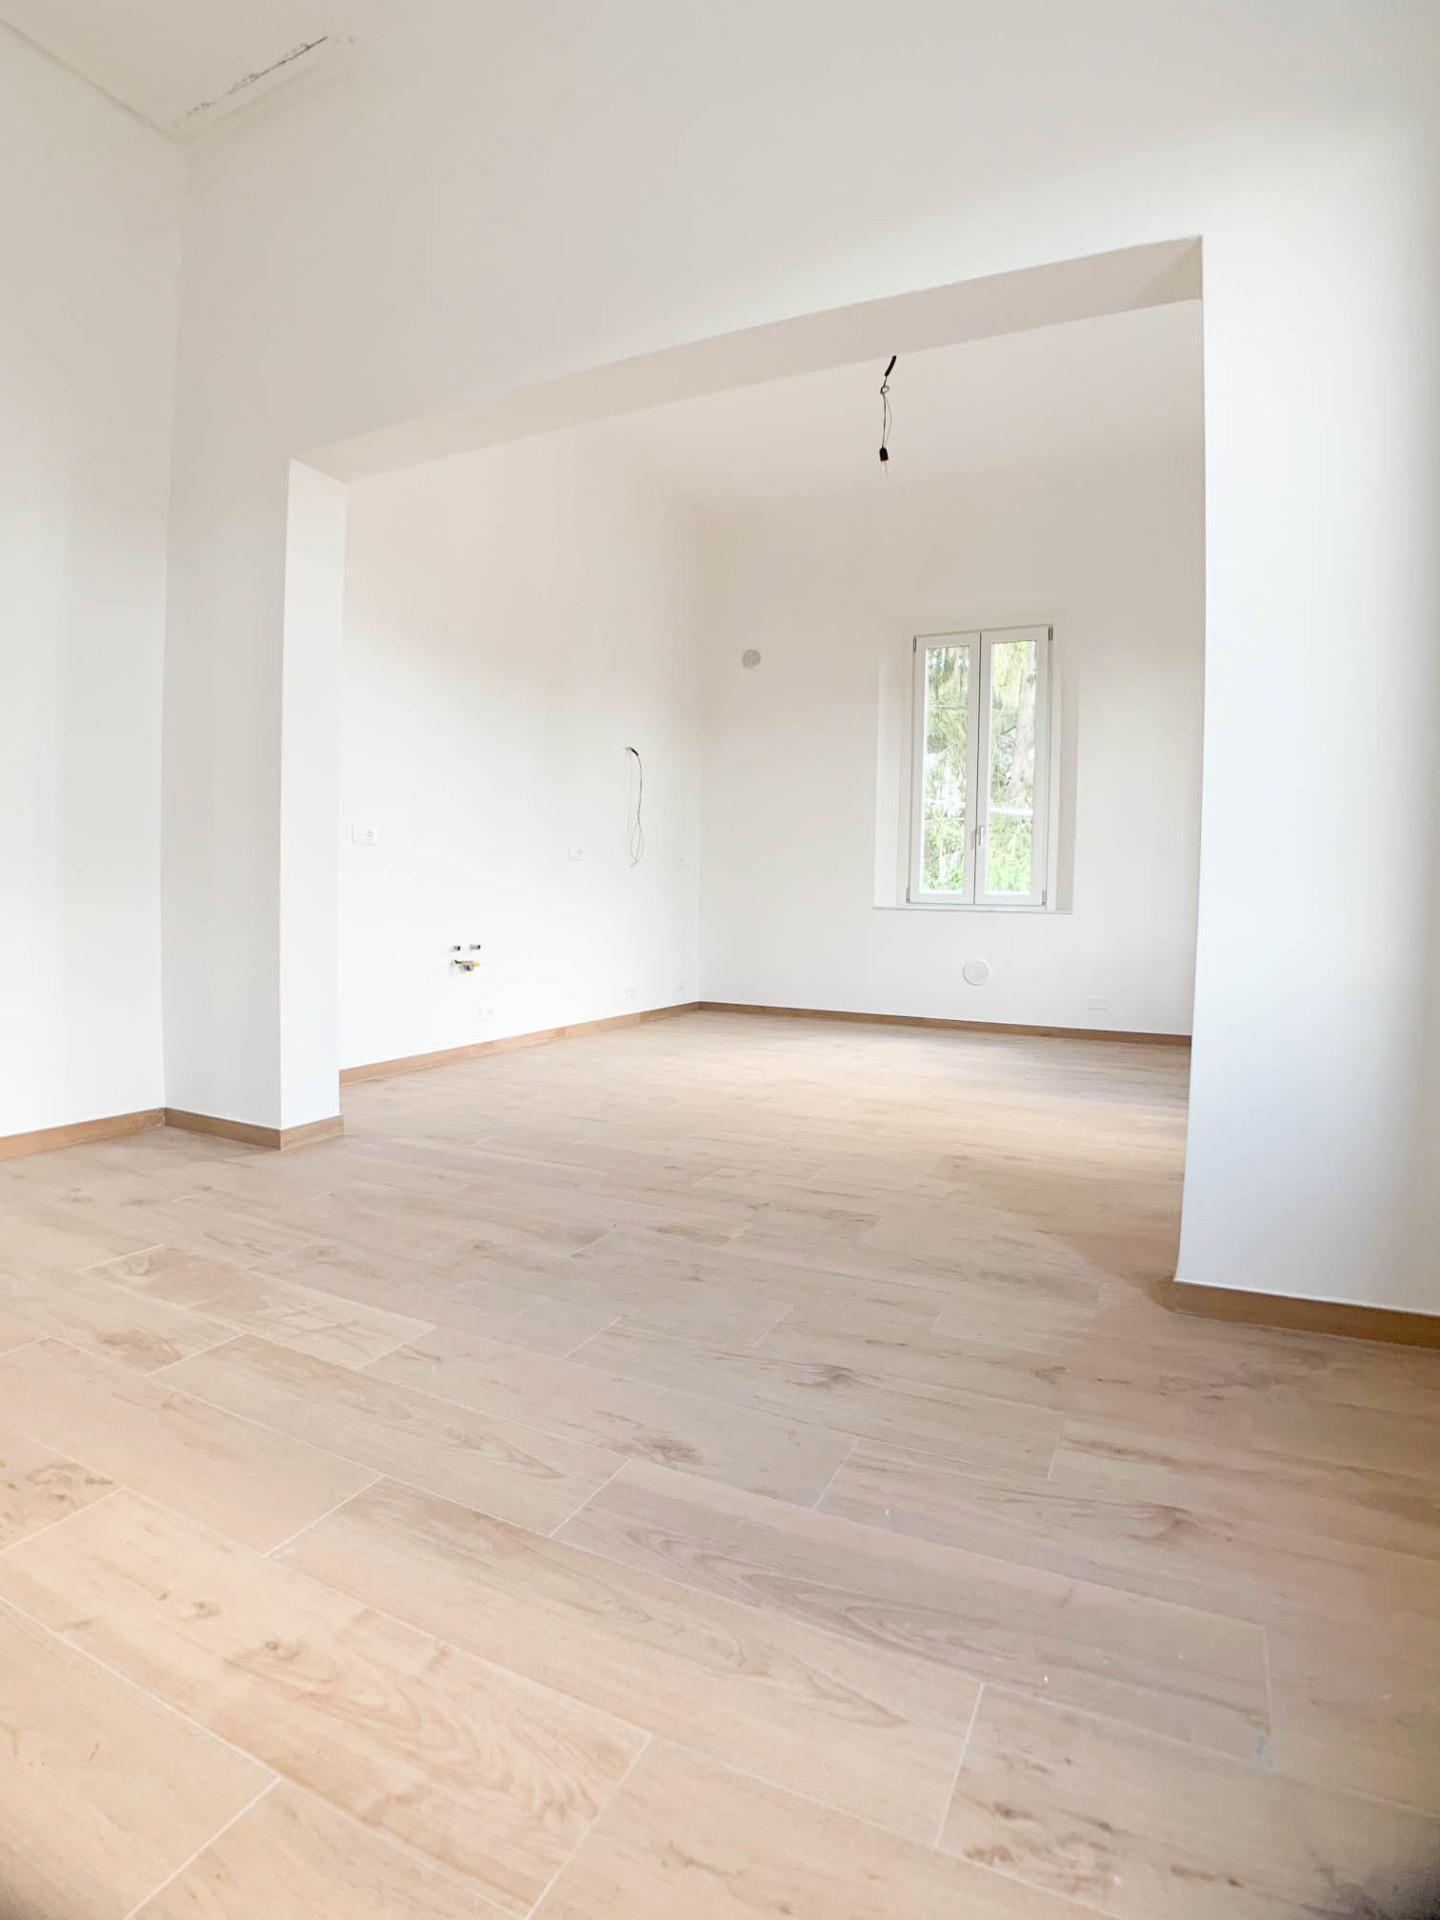 Porzione di casa in vendita, rif. 216v